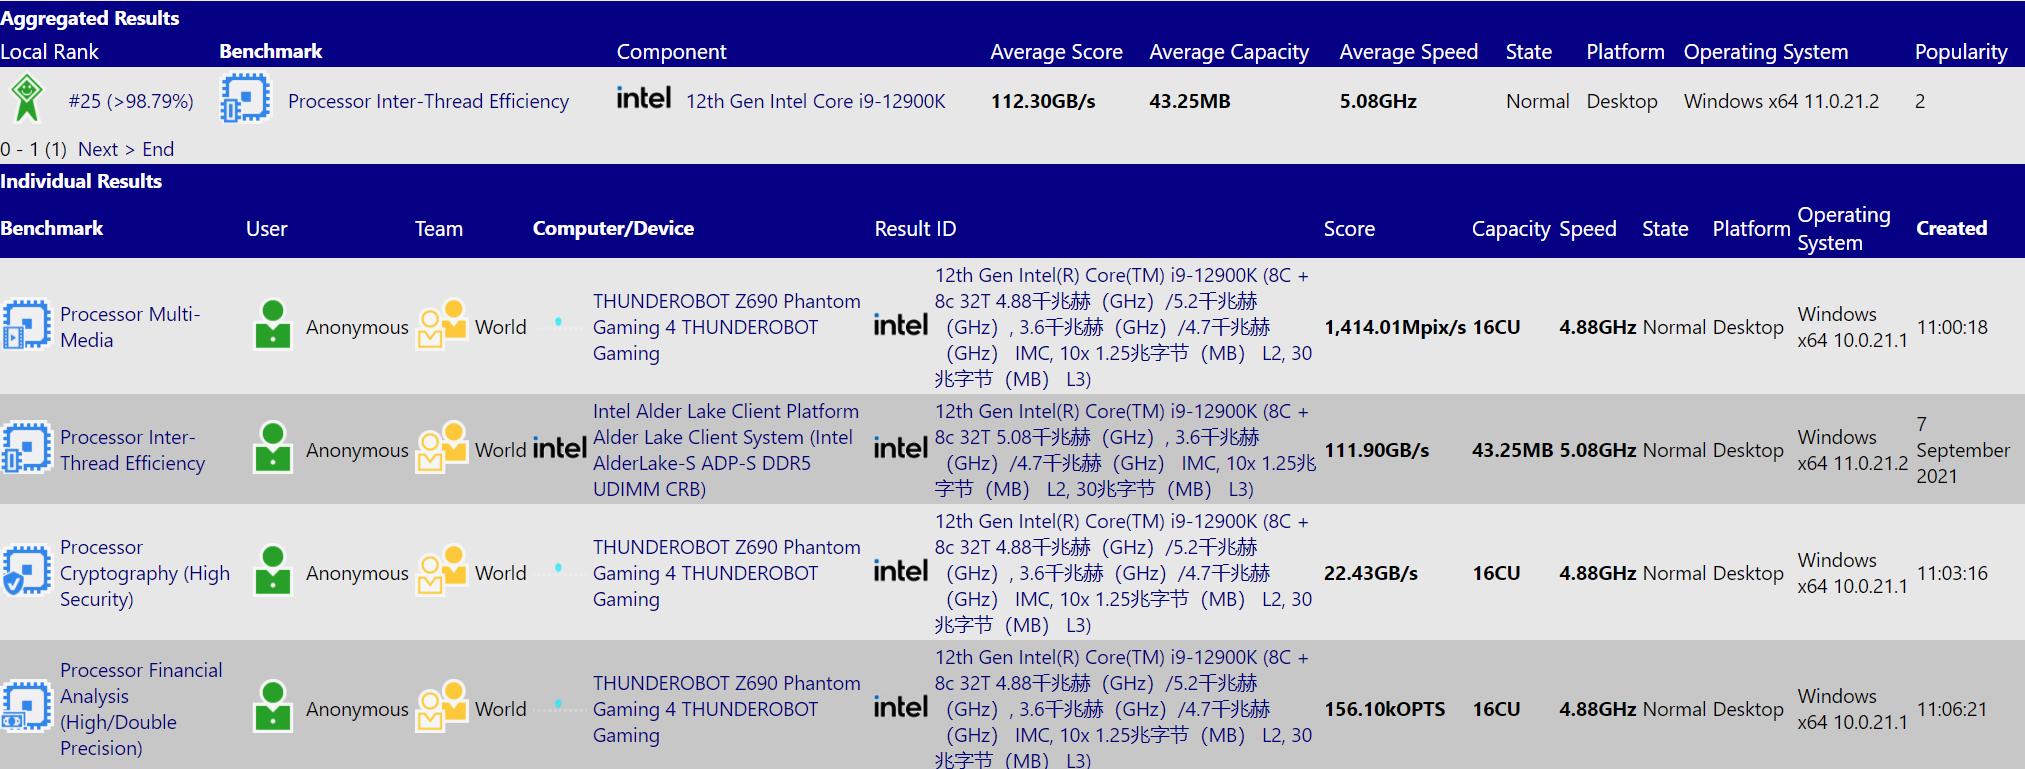 Intel-Core-i9-12900K-benchmark_1.png